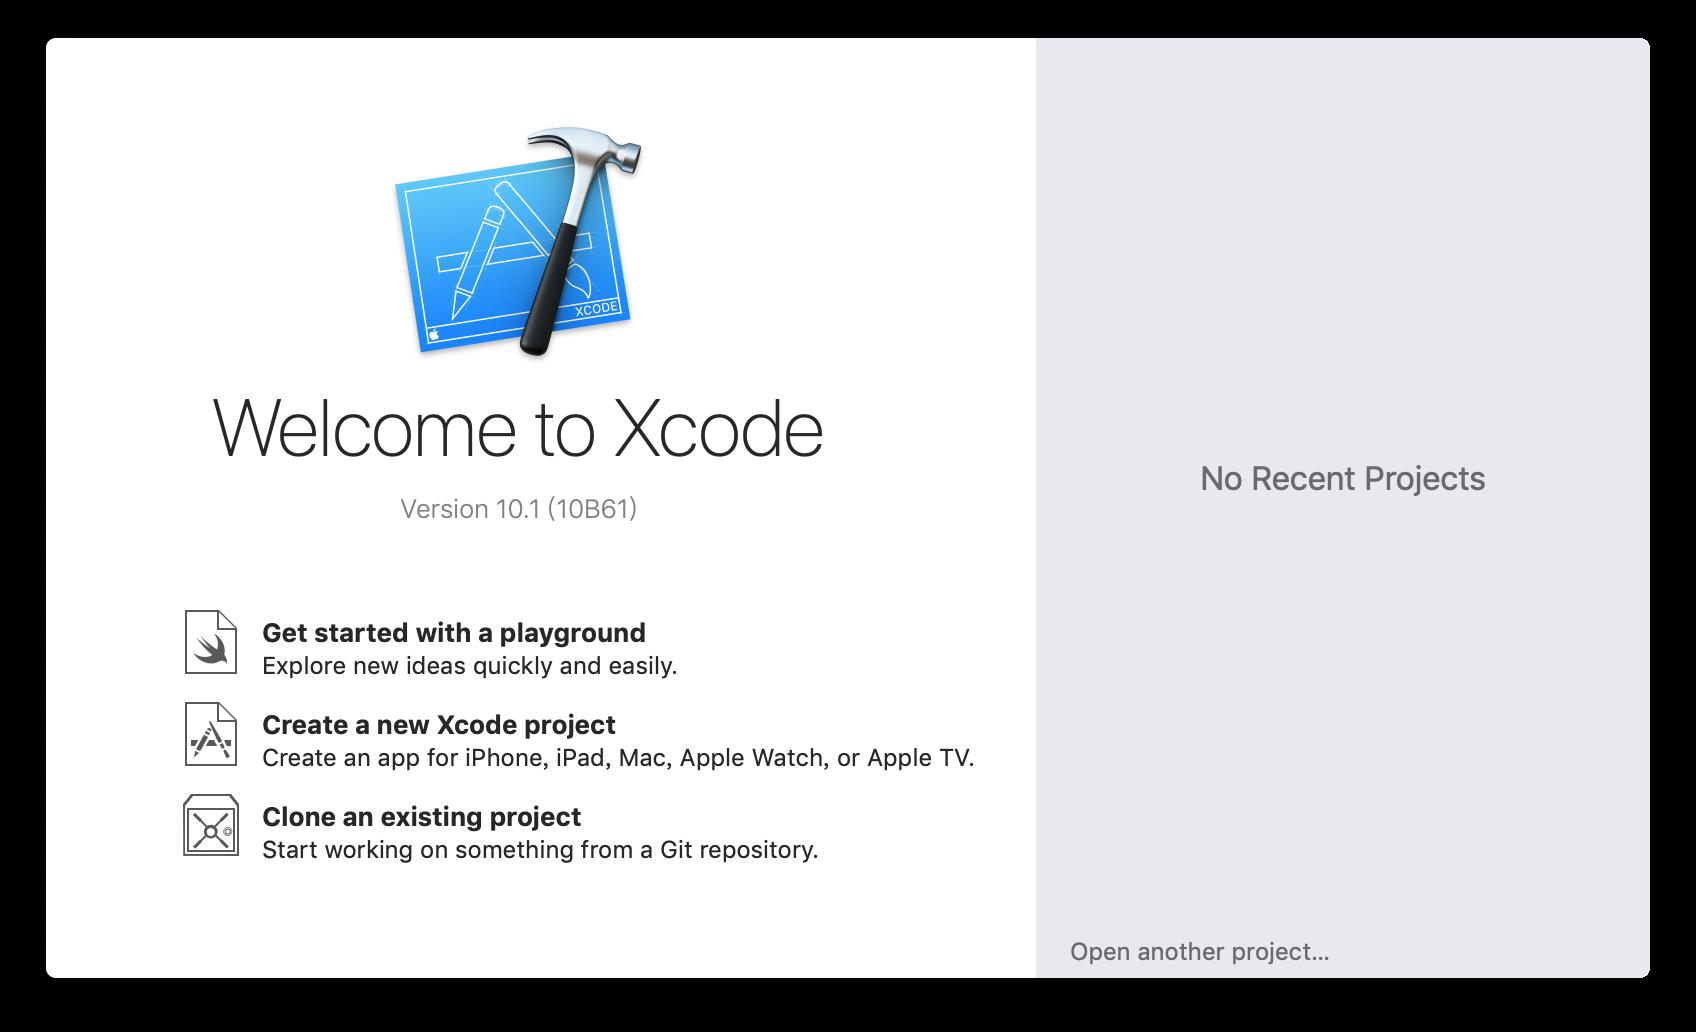 啟動 Xcode